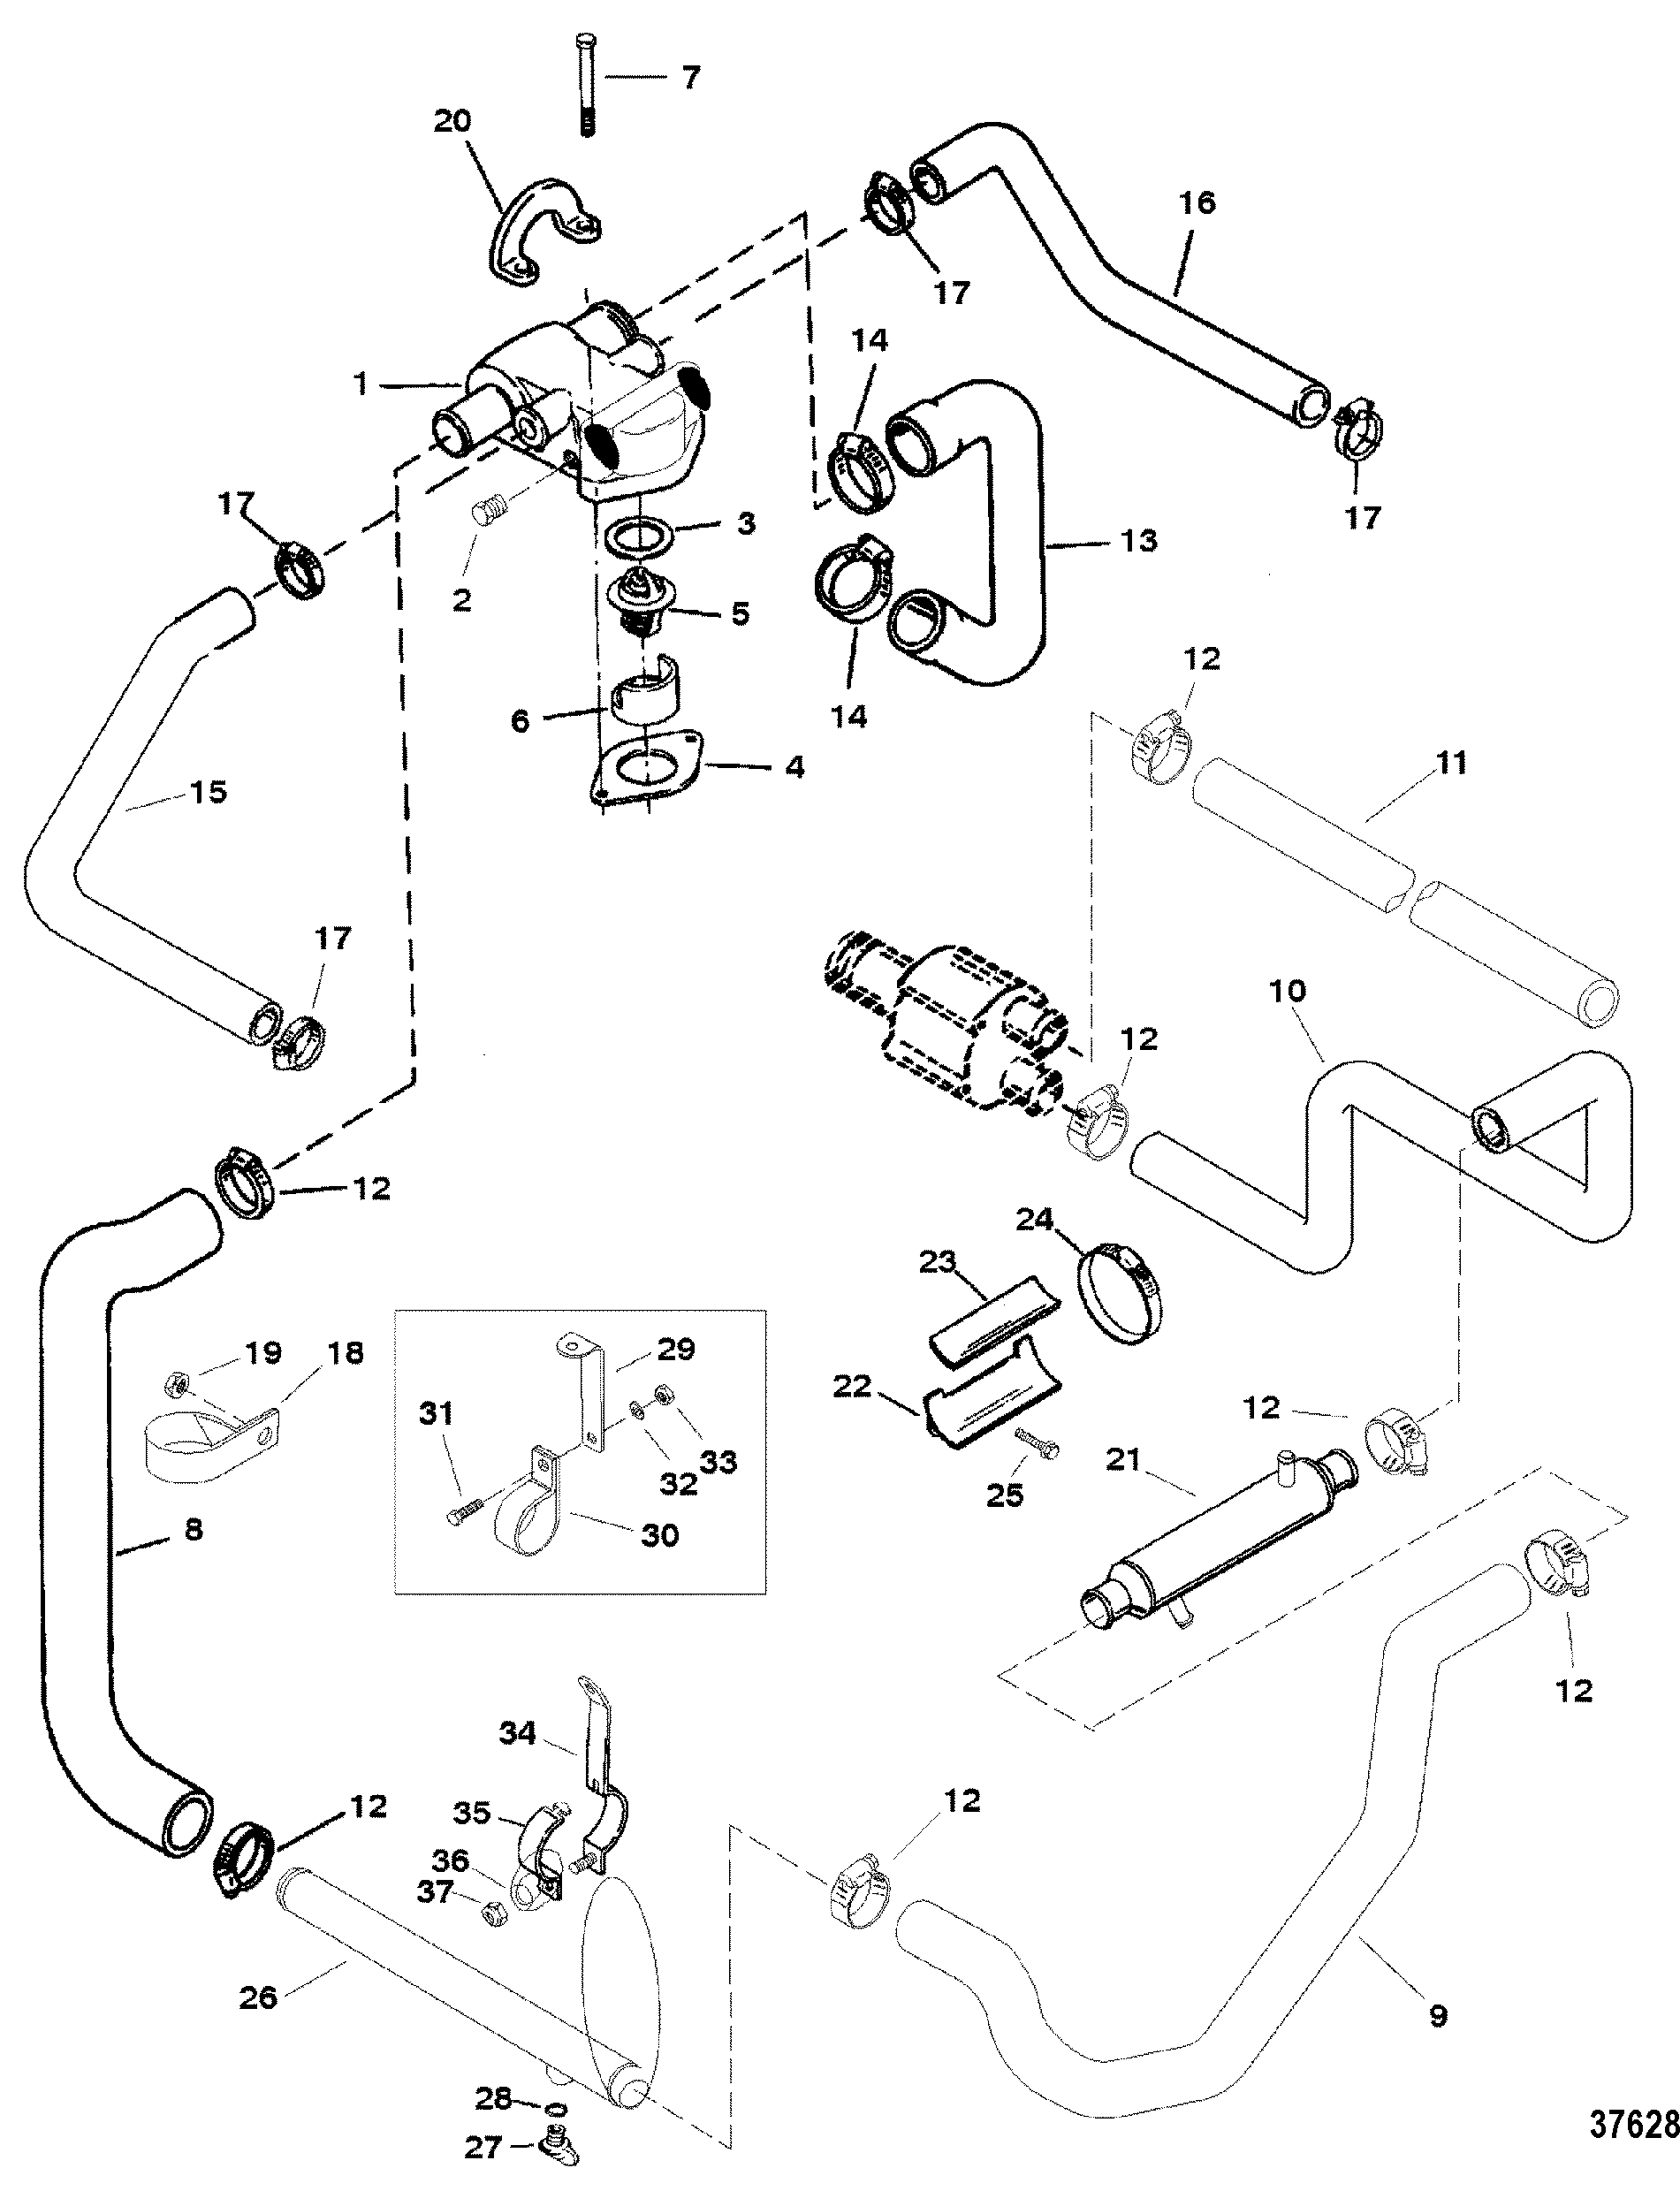 standard cooling system bravo engines for mercruiser 5 7l